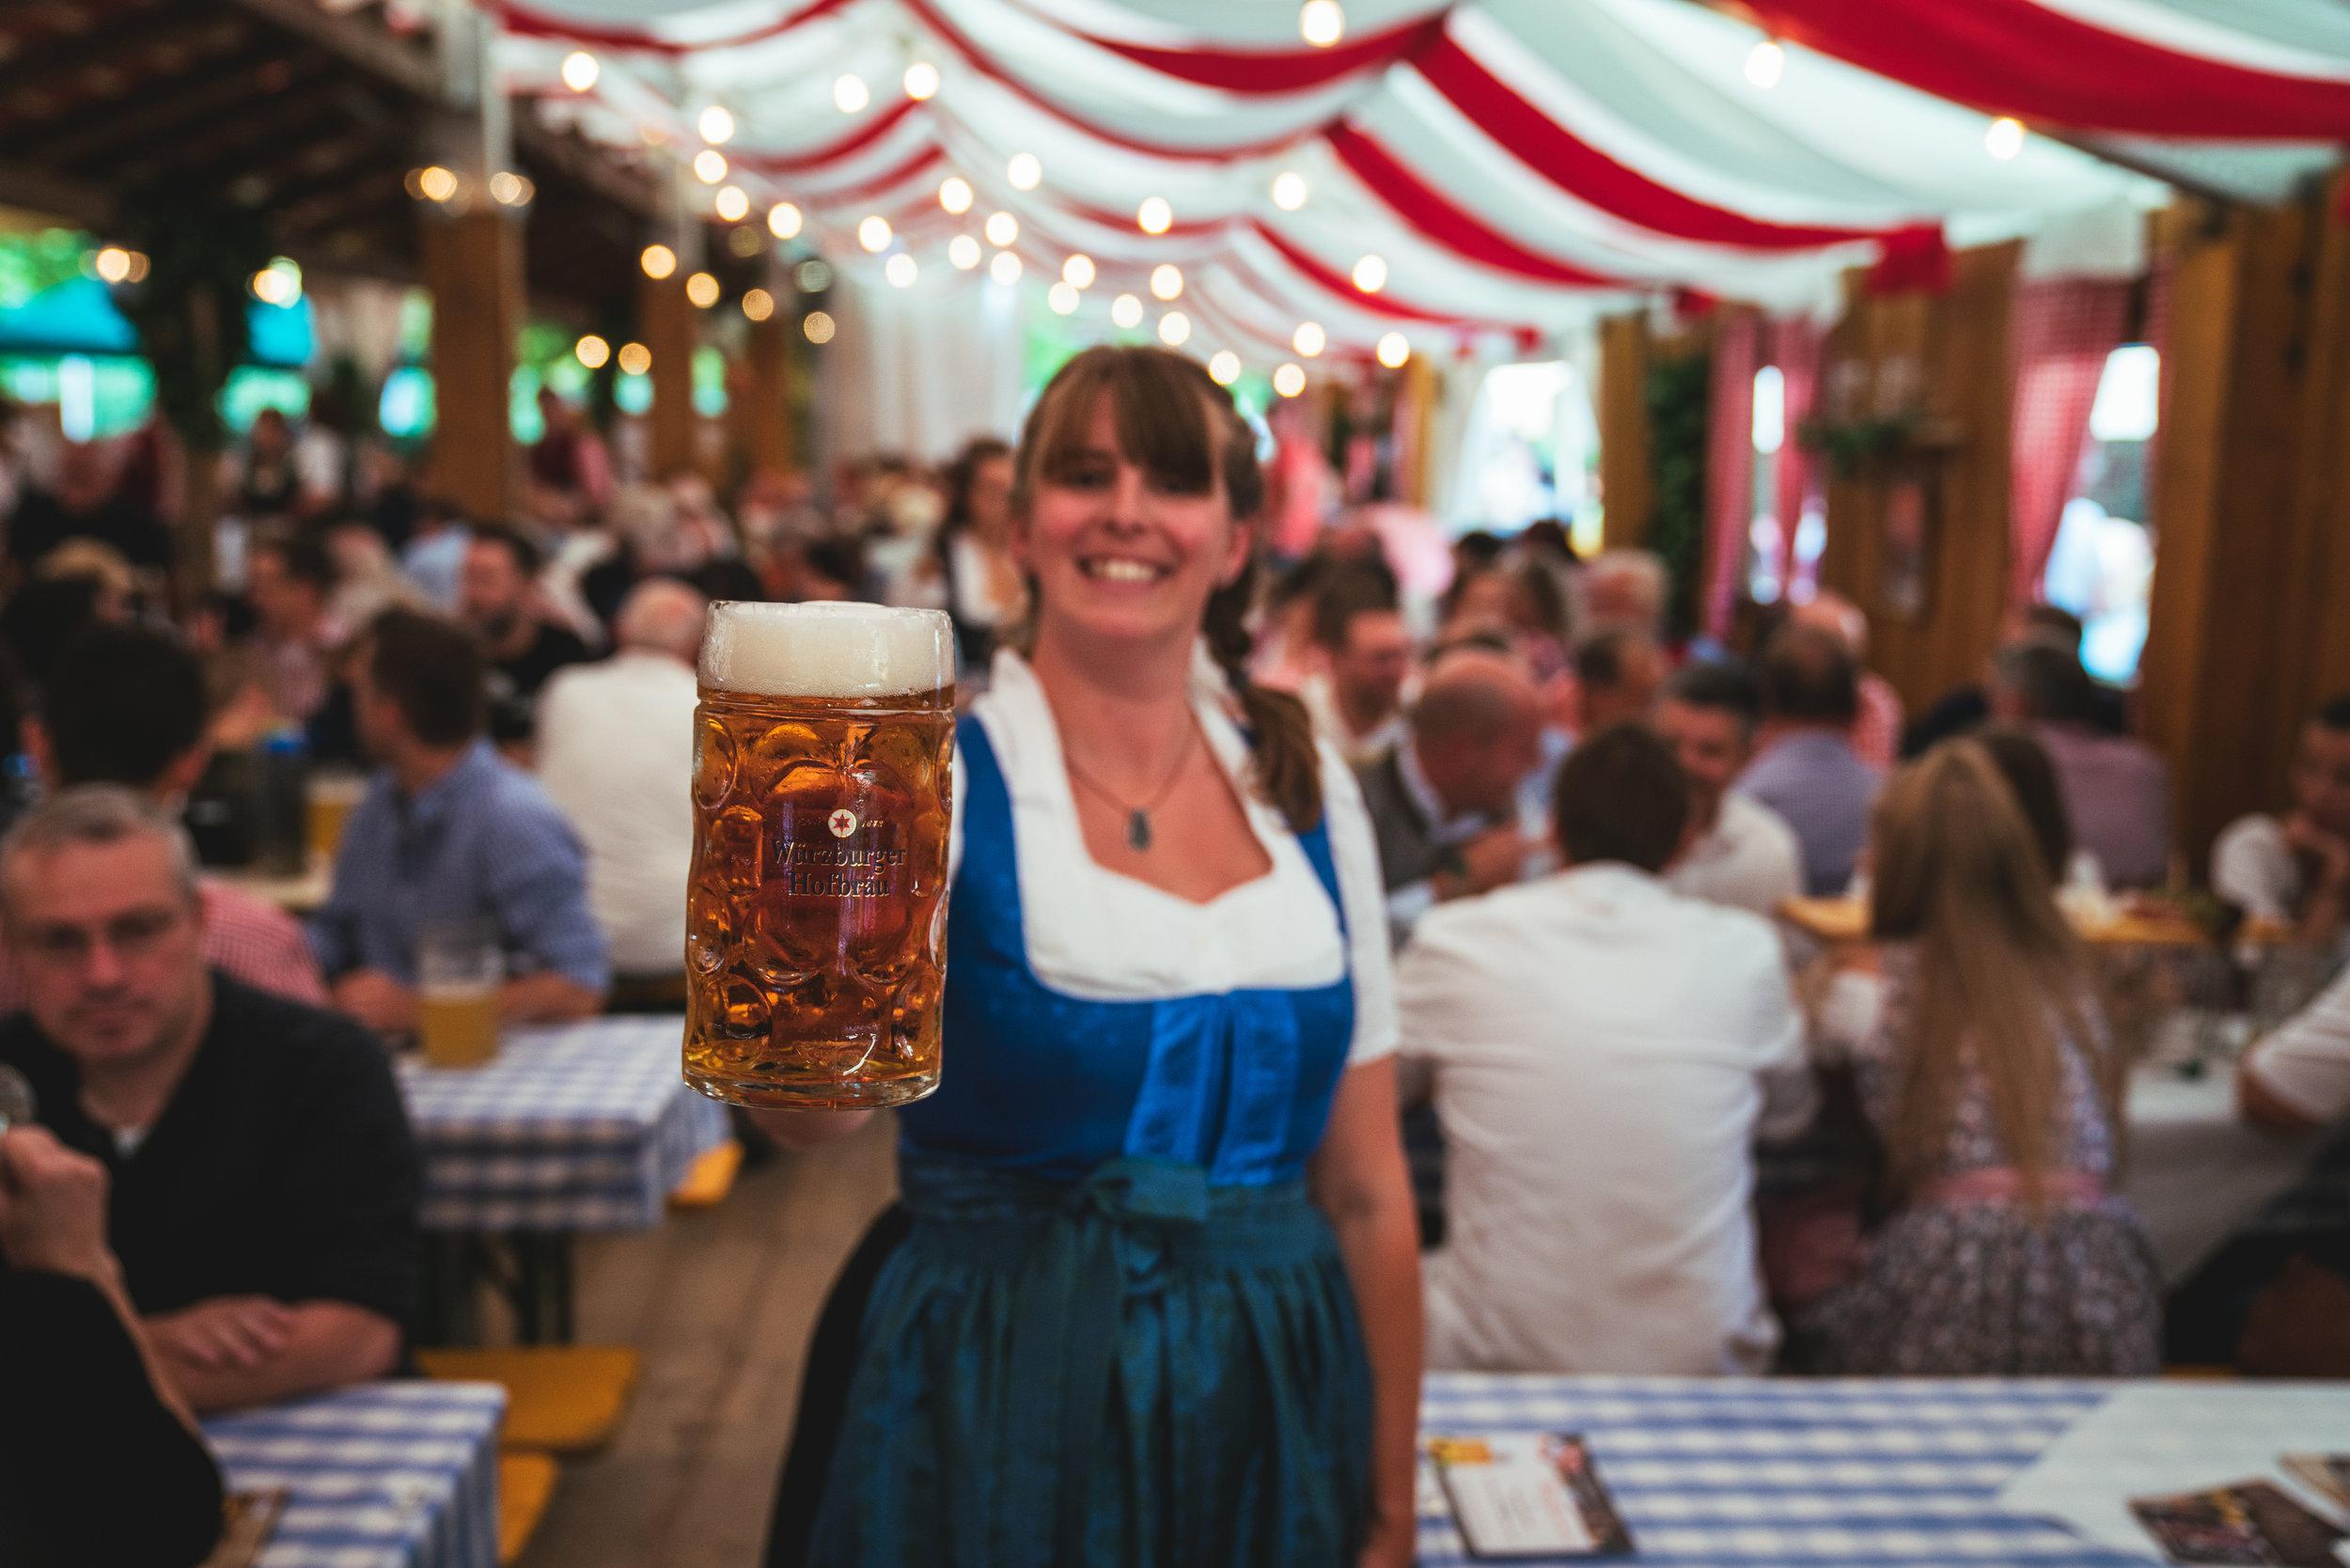 Wuerzburg Festivals - Attend one of Wuerzburg's seasonal festivals!